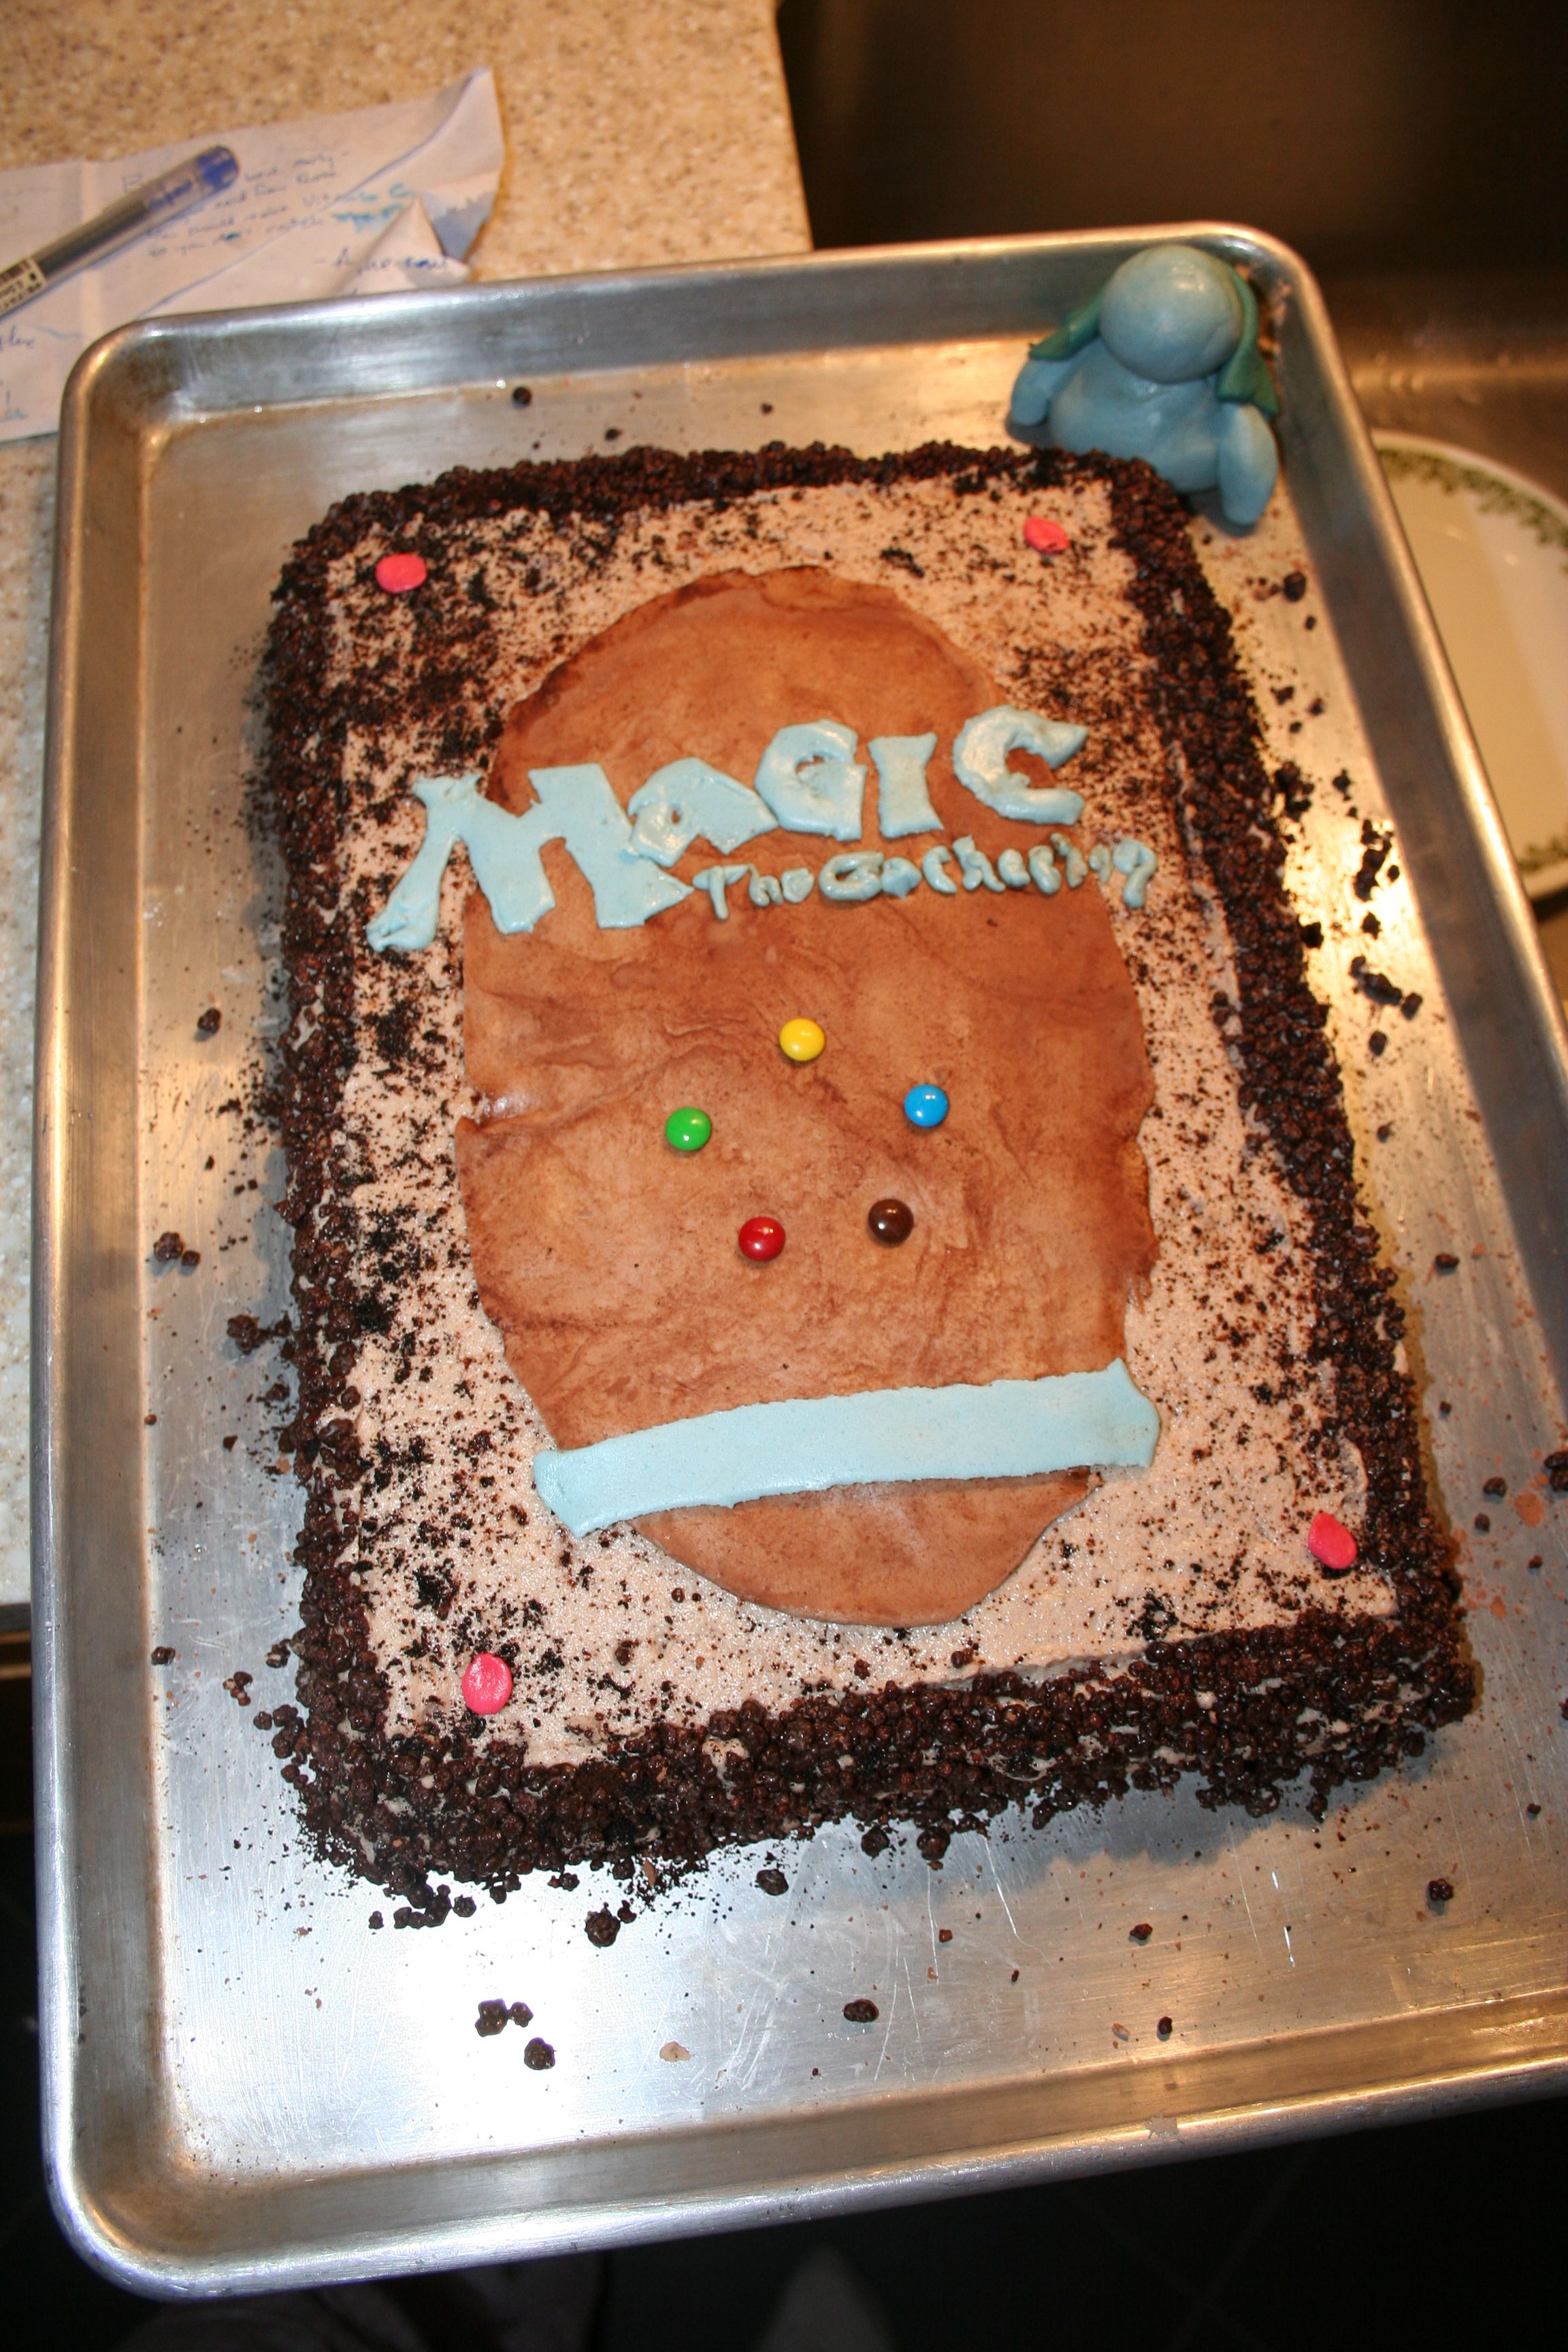 MAgic The Gathering Cake